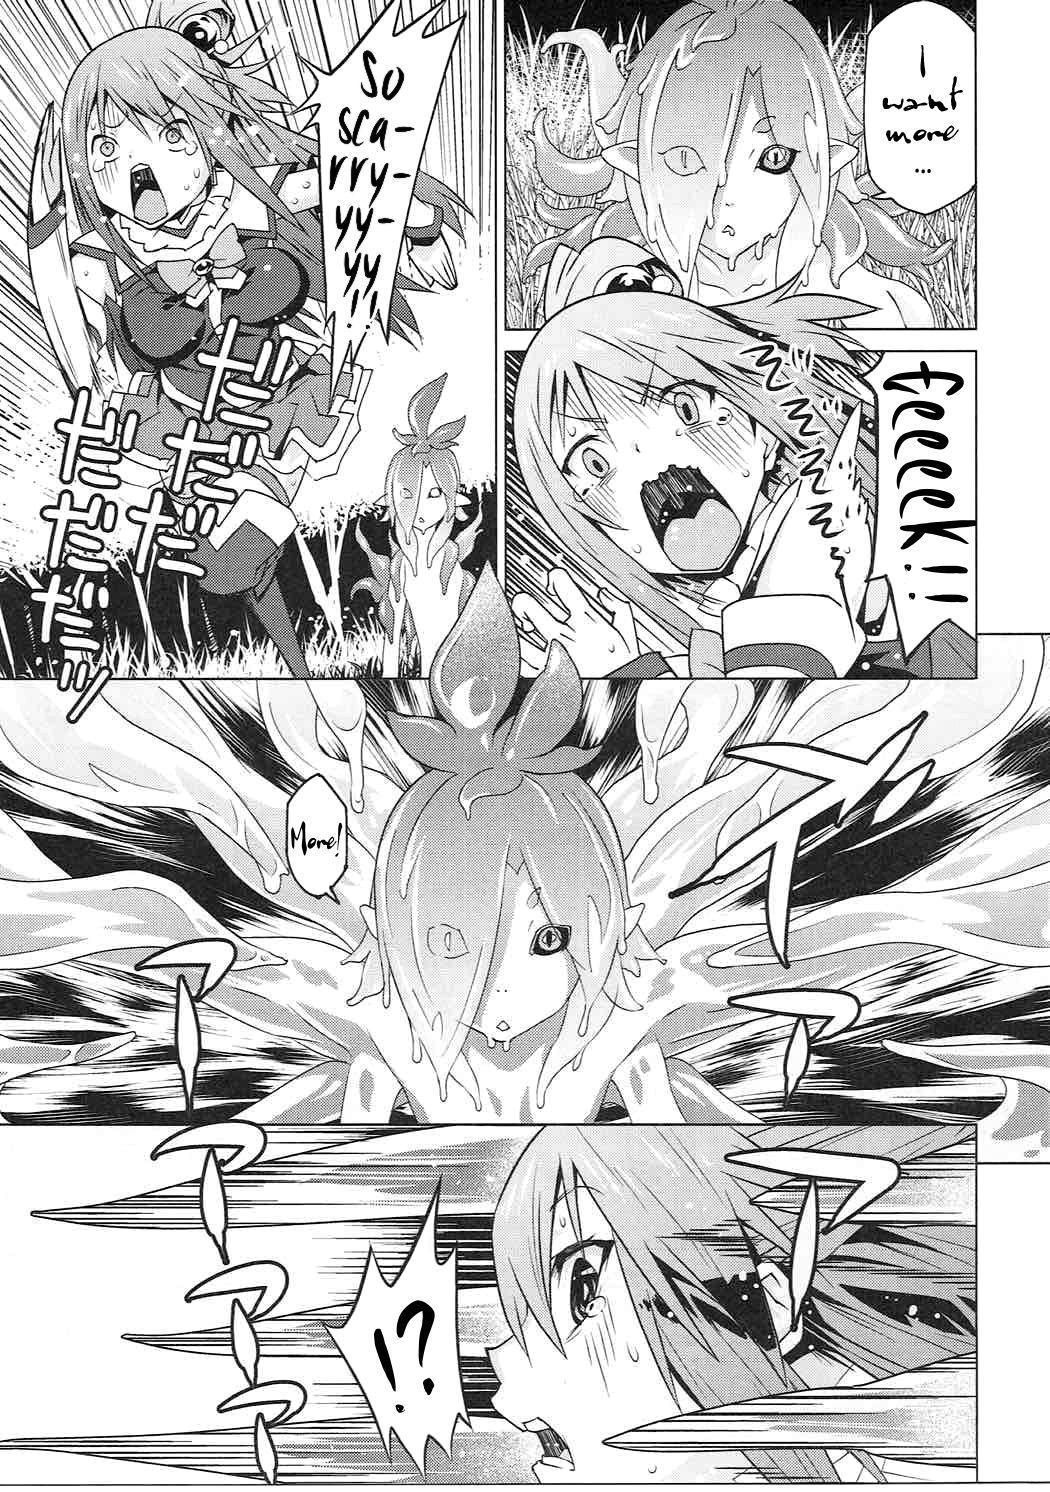 Kono Megami o Uneune Okasu Usui Hon | A thin book where this goddess gets ravished sinuously 5